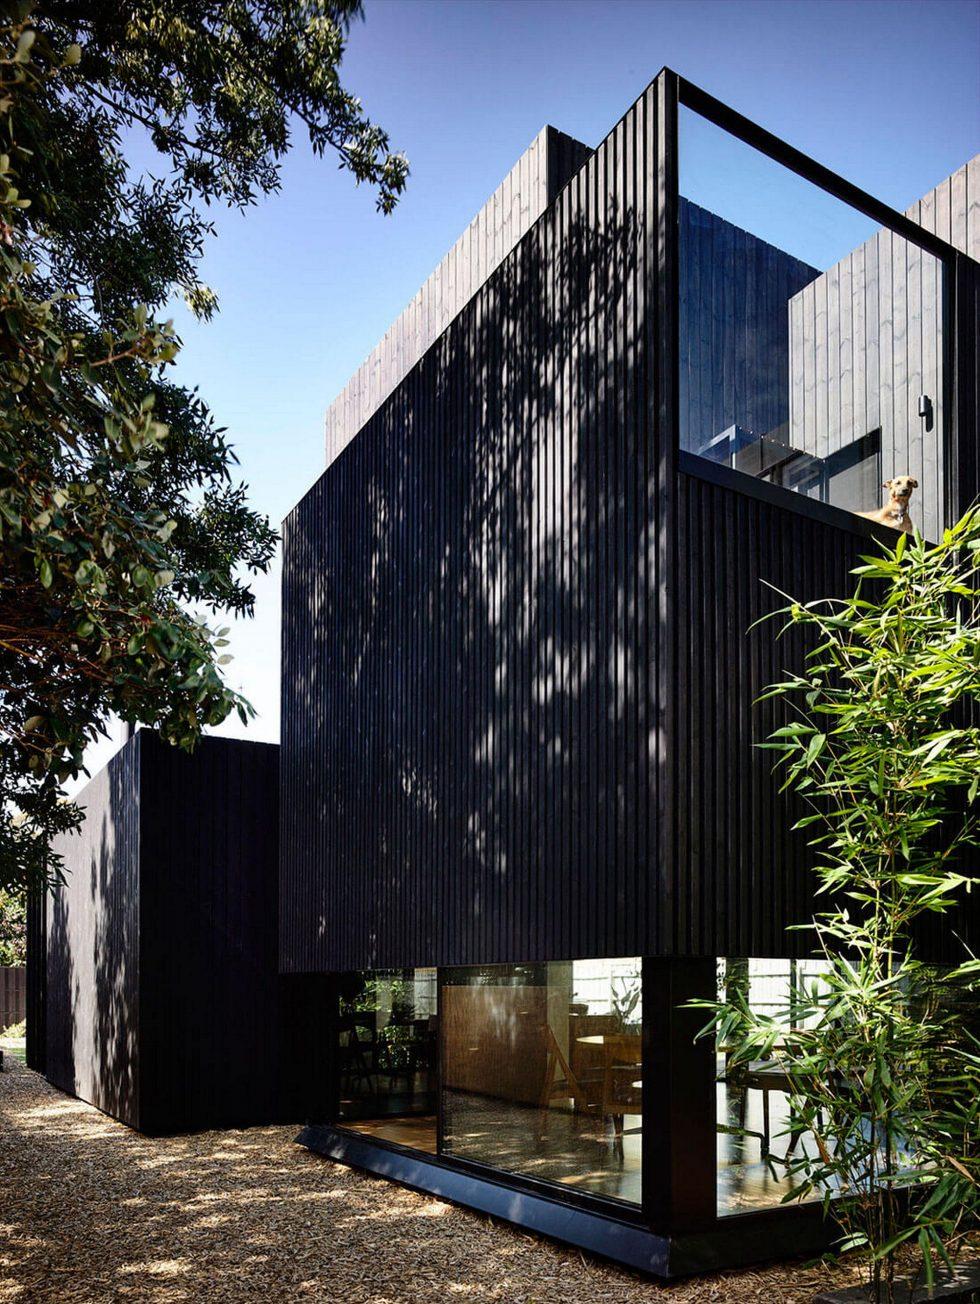 Contemporary House Renovation Of The ХІХ-Century House By Ola Studio Australia 14